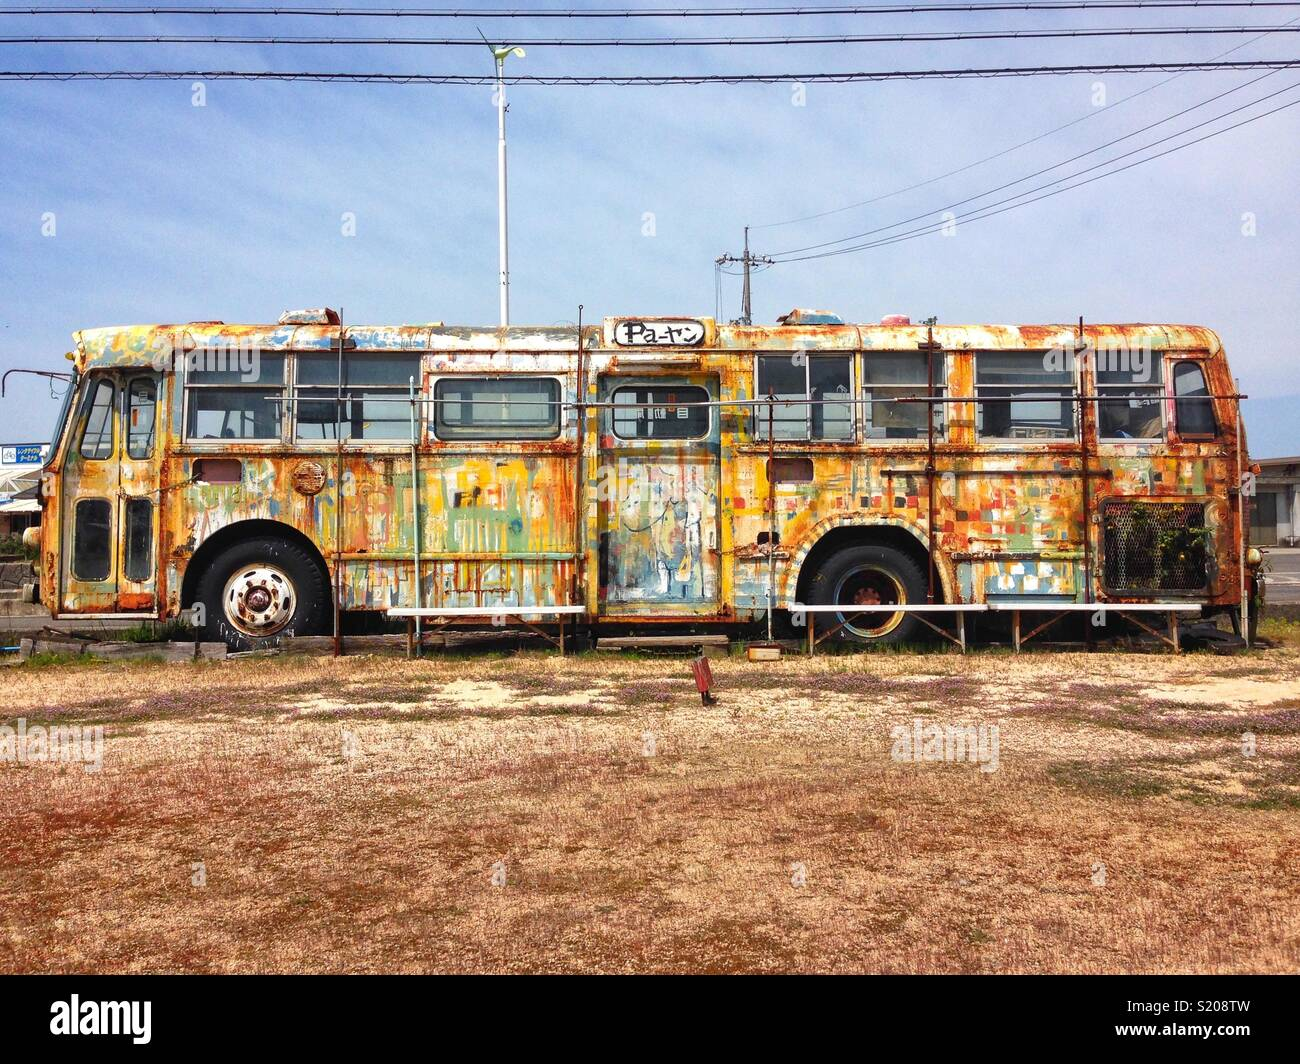 Onomichi, Bus Photo Stock